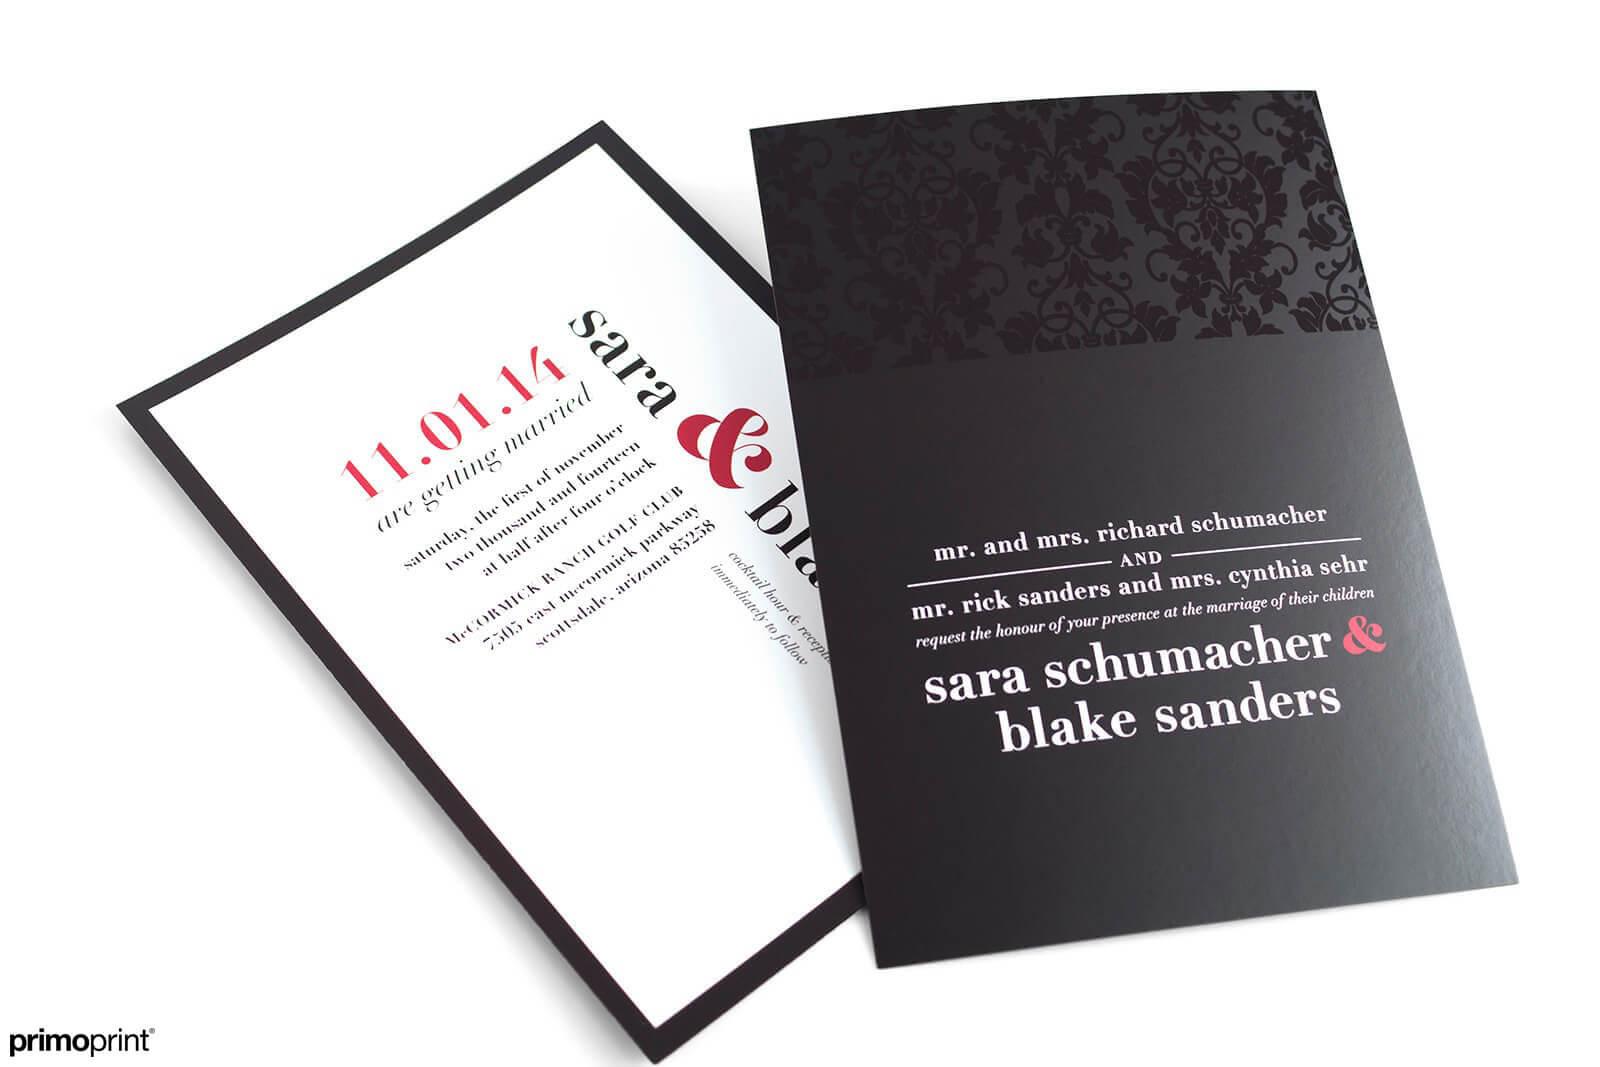 Silk Laminated Wedding Invitation with Spot UV | Primoprint